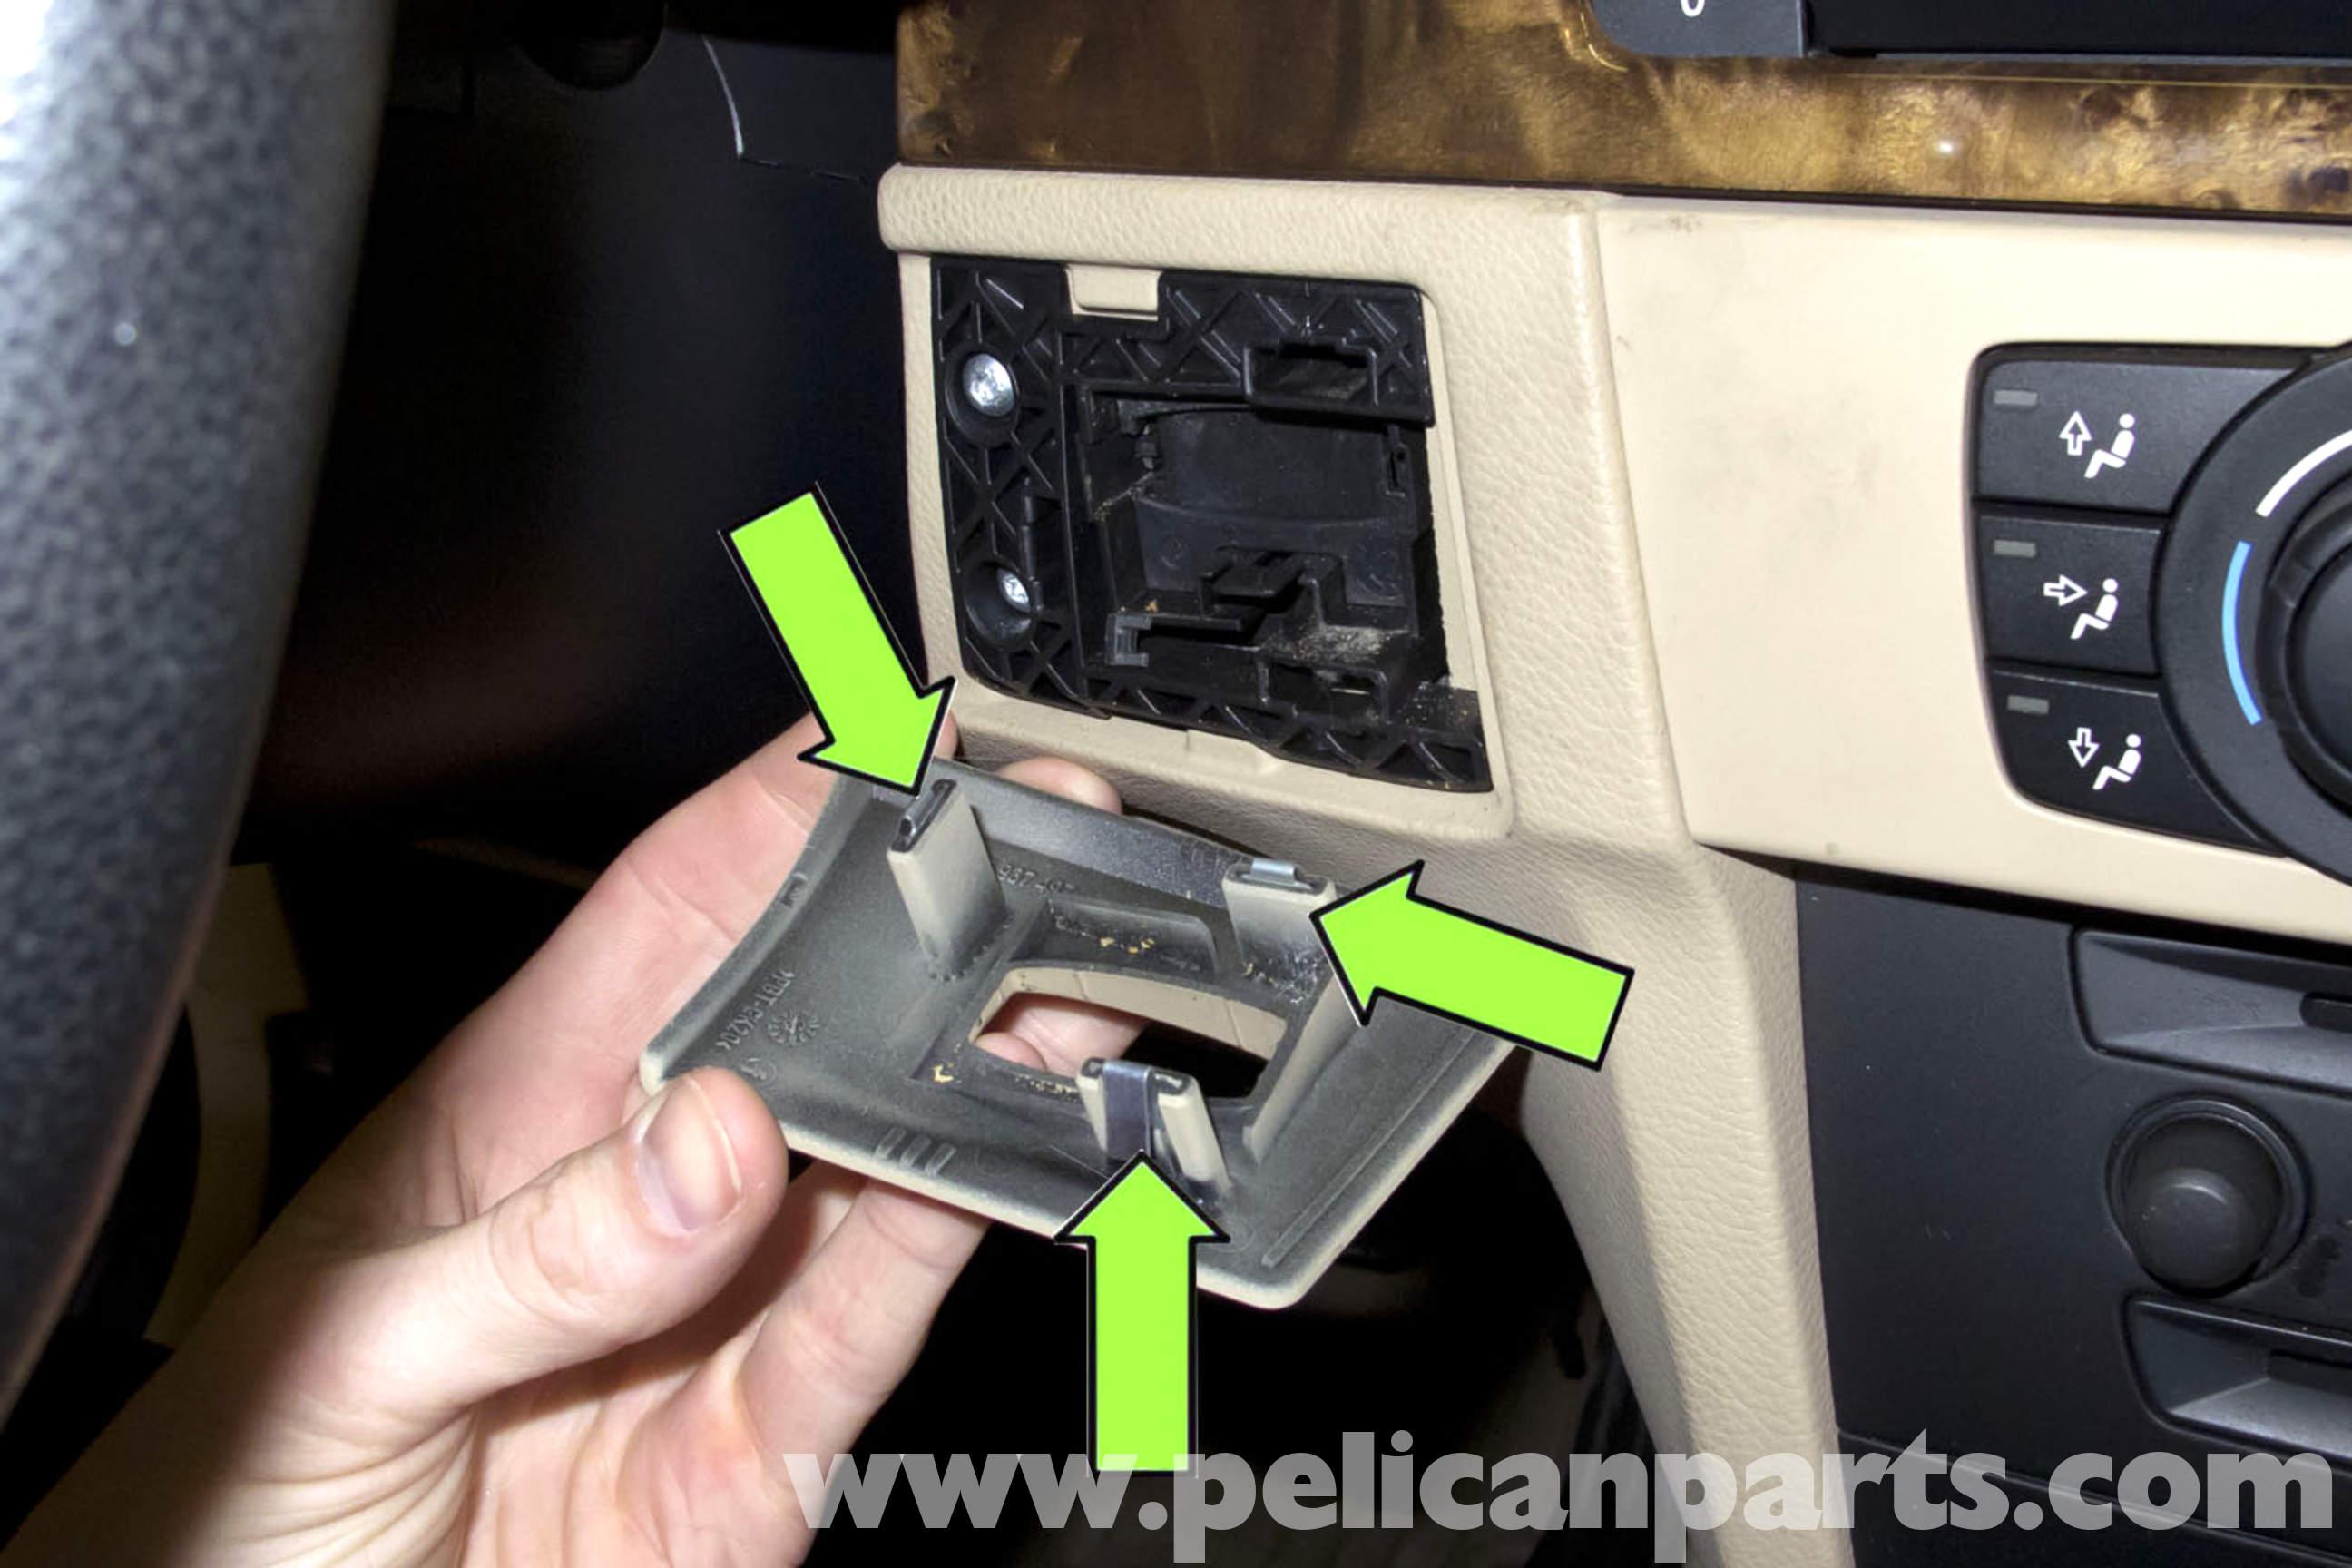 E60 Headlight Wiring Diagram Bmw E90 Remote Key Slot Replacement E91 E92 E93